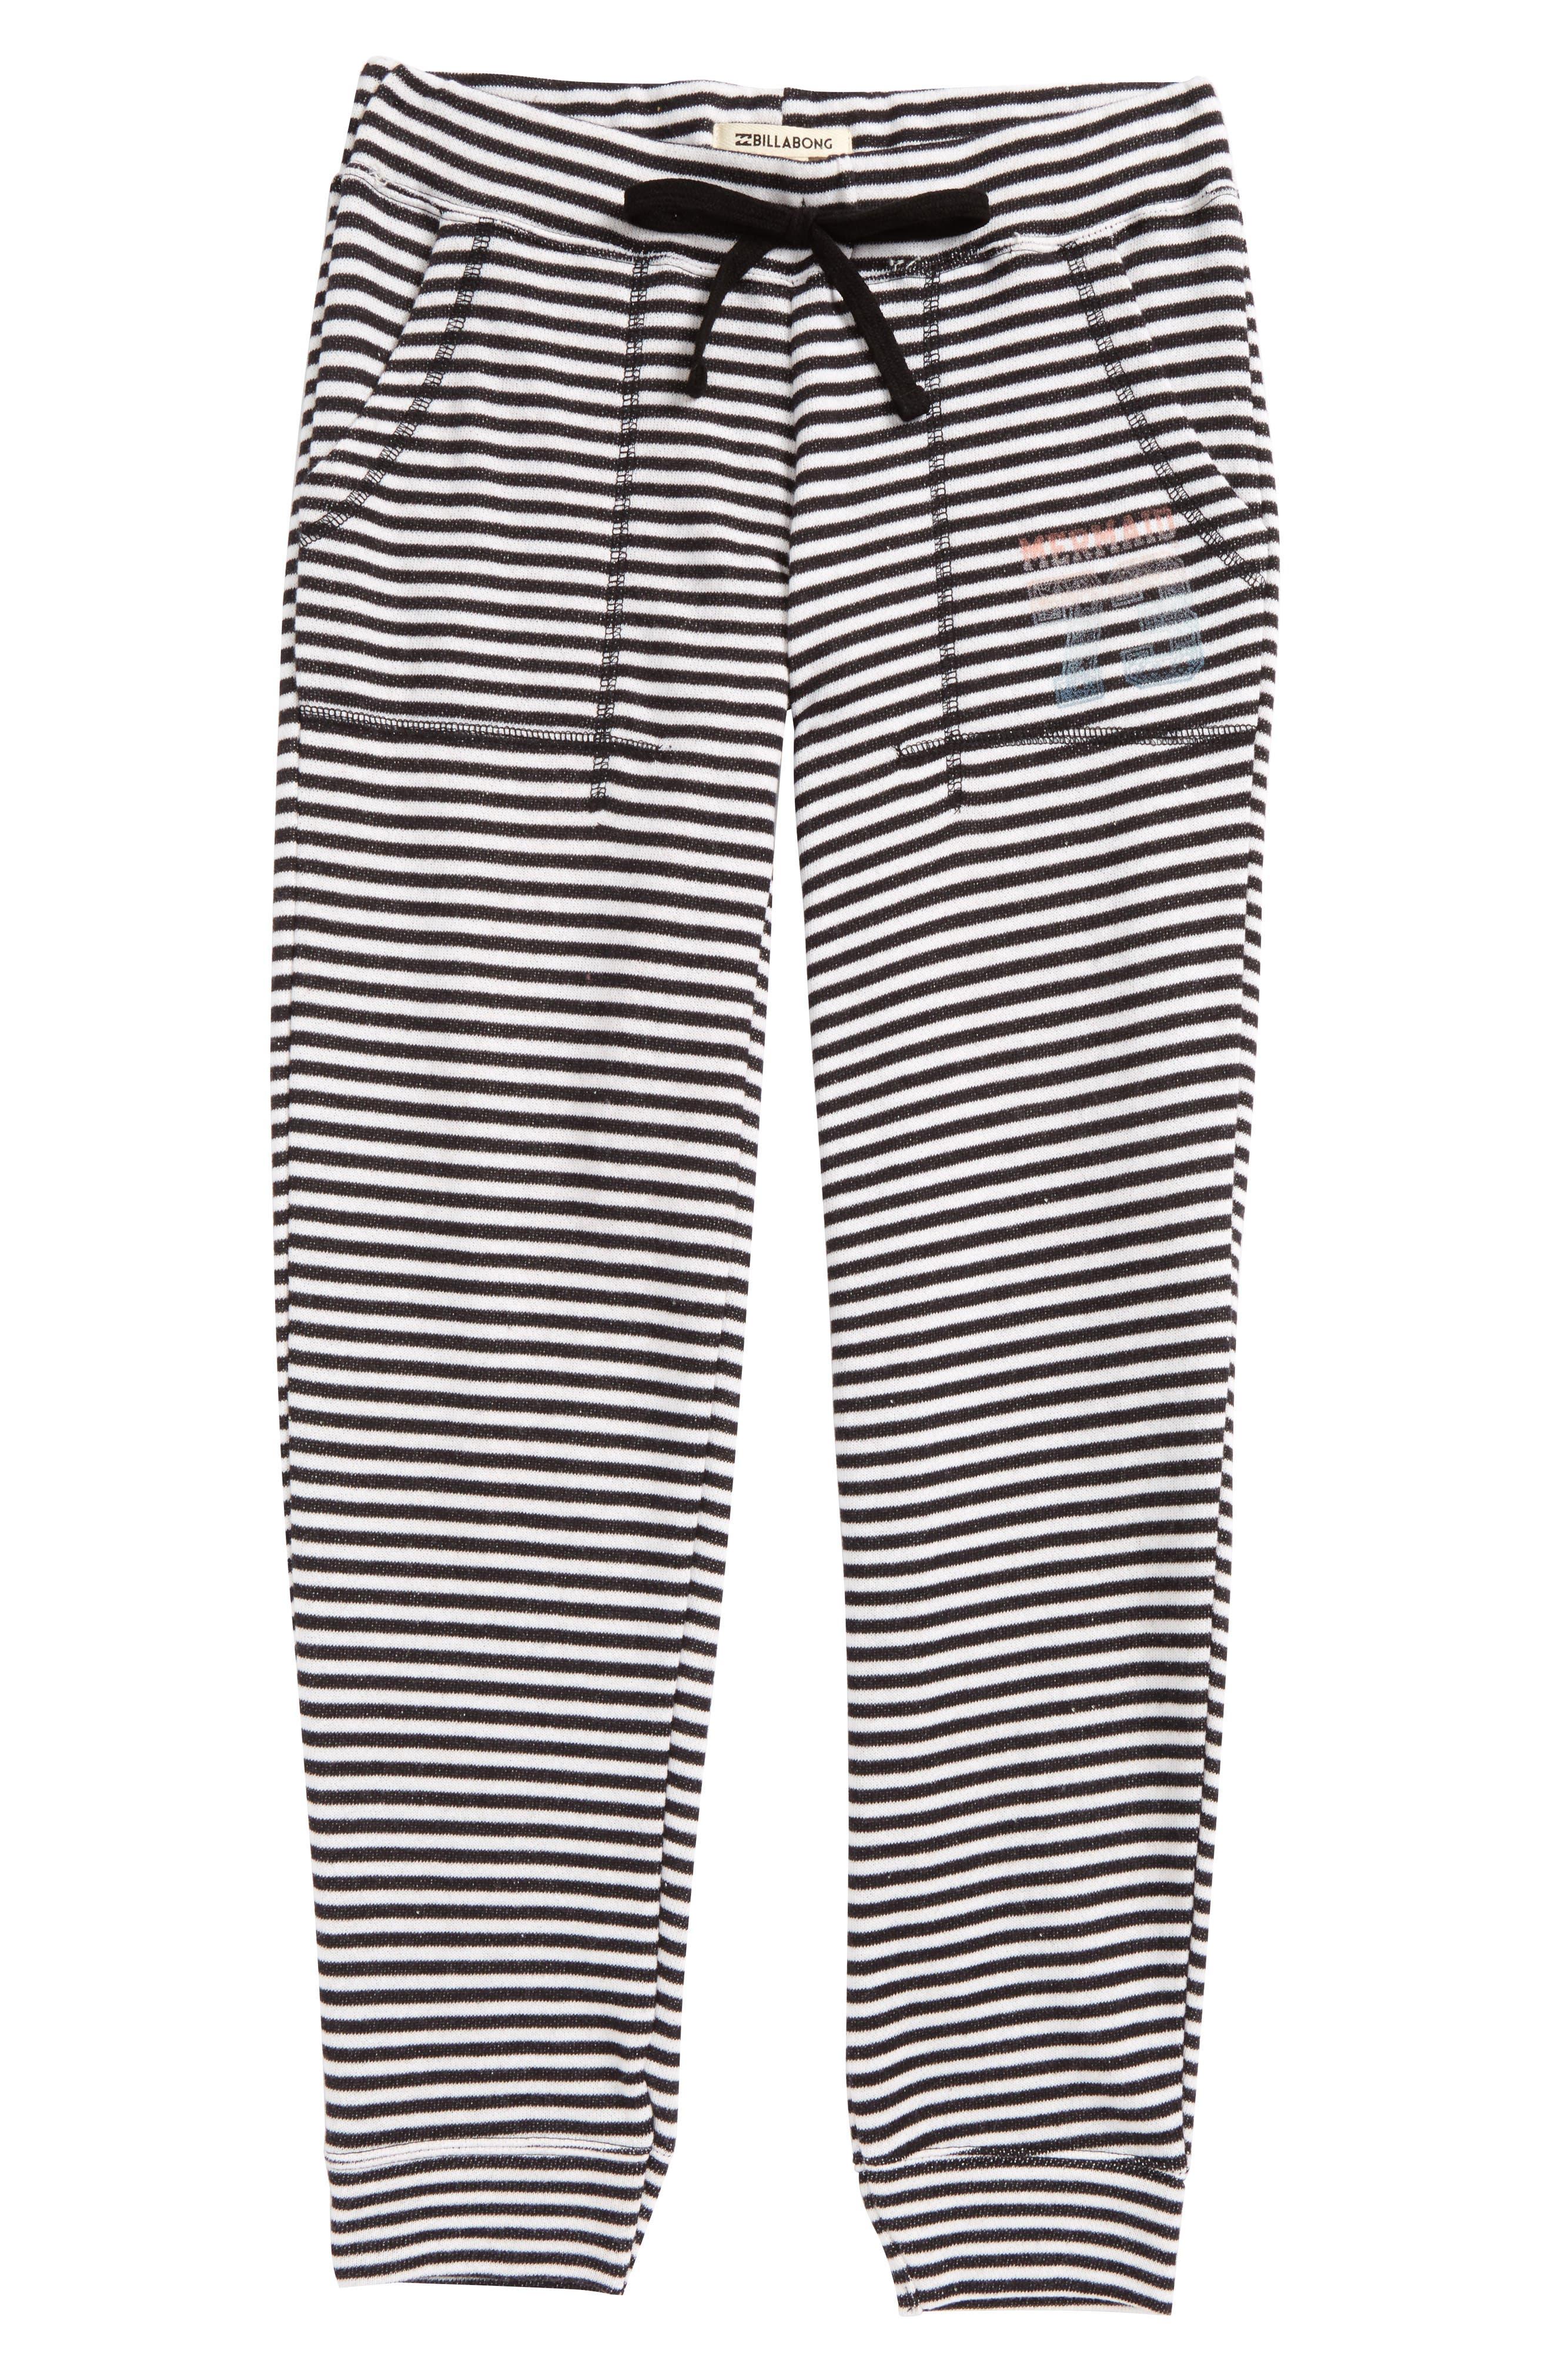 Safe Love Knit Pants,                             Main thumbnail 1, color,                             001